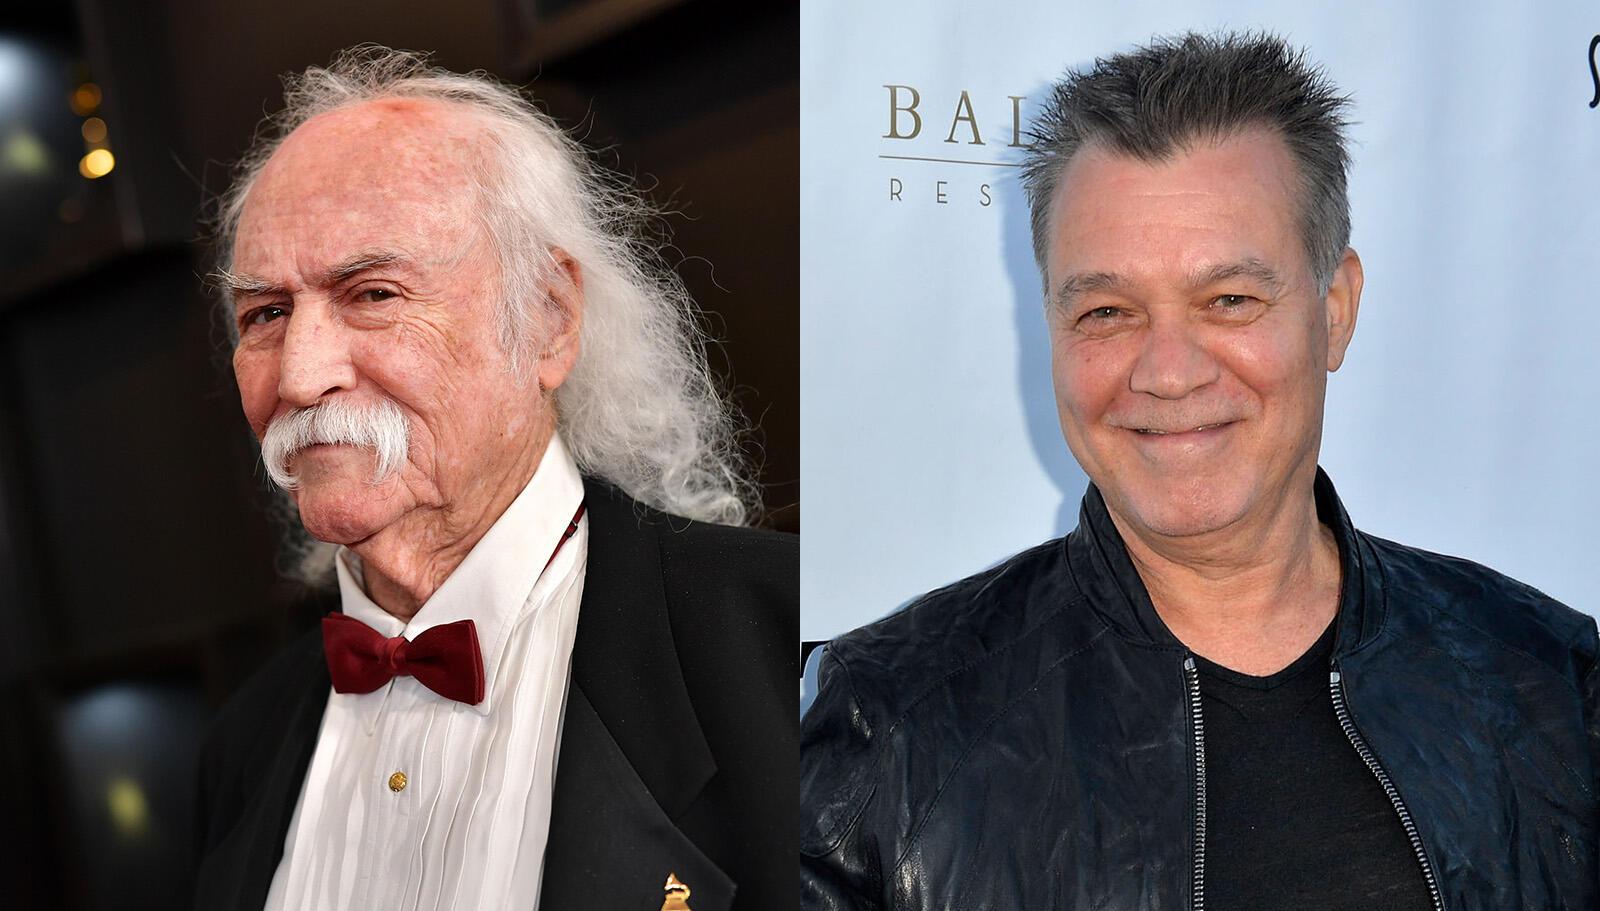 David Crosby Fully Retracts Comments Dismissive Of Eddie Van Halen's Legacy